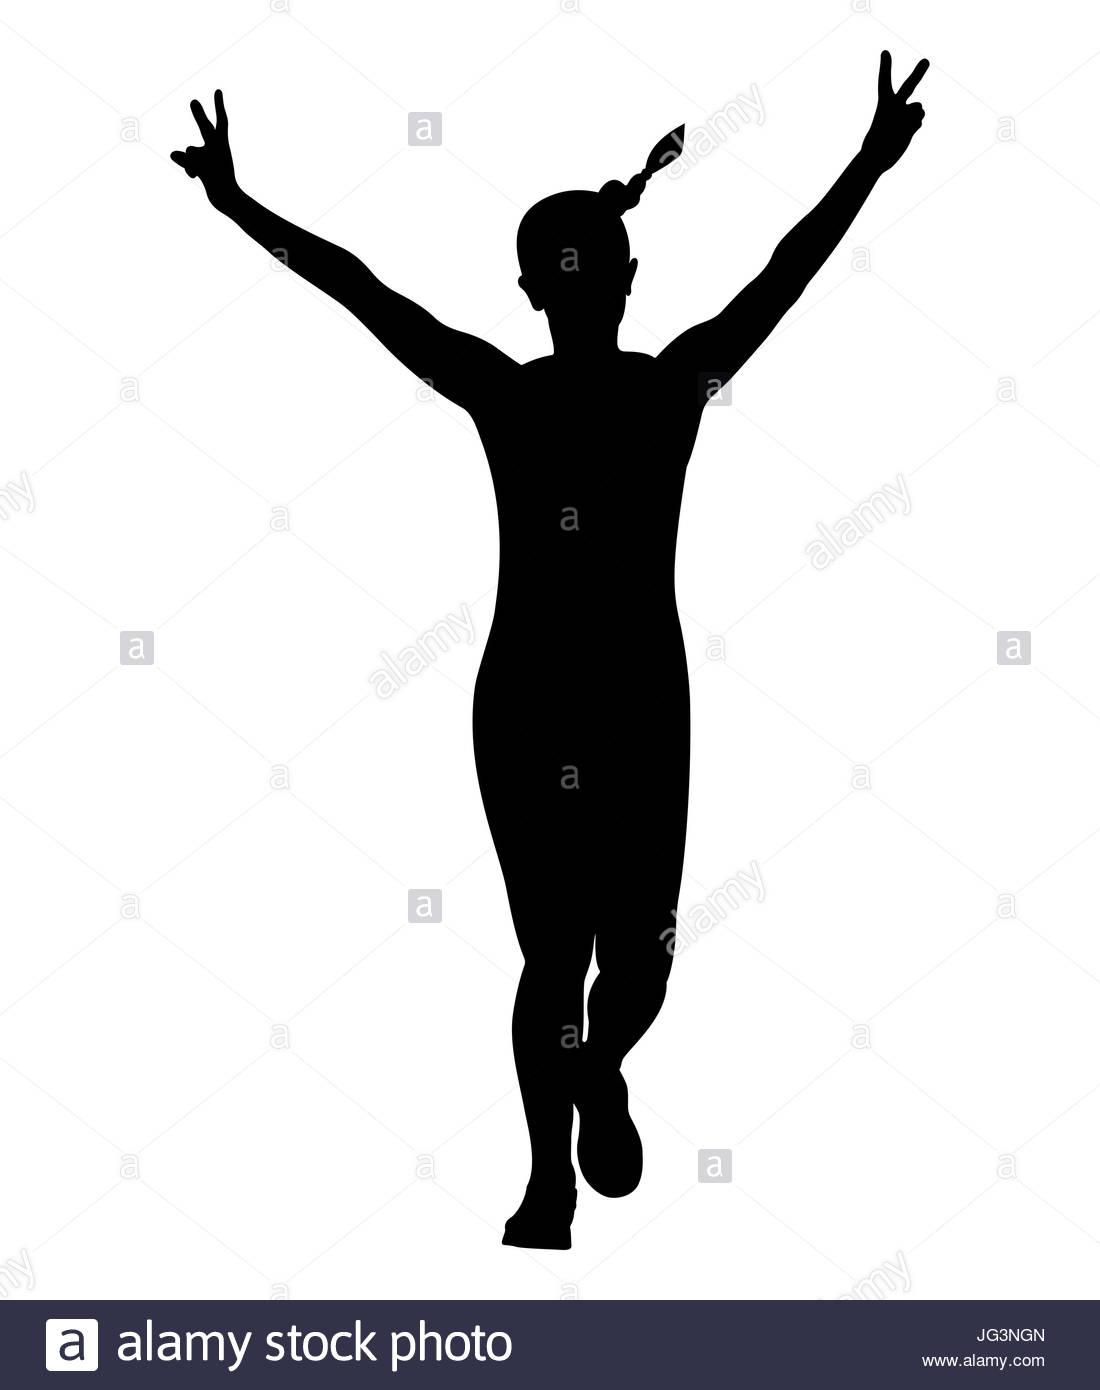 1100x1390 Girl Running Hand Peace Symbols Black Silhouette Stock Photo